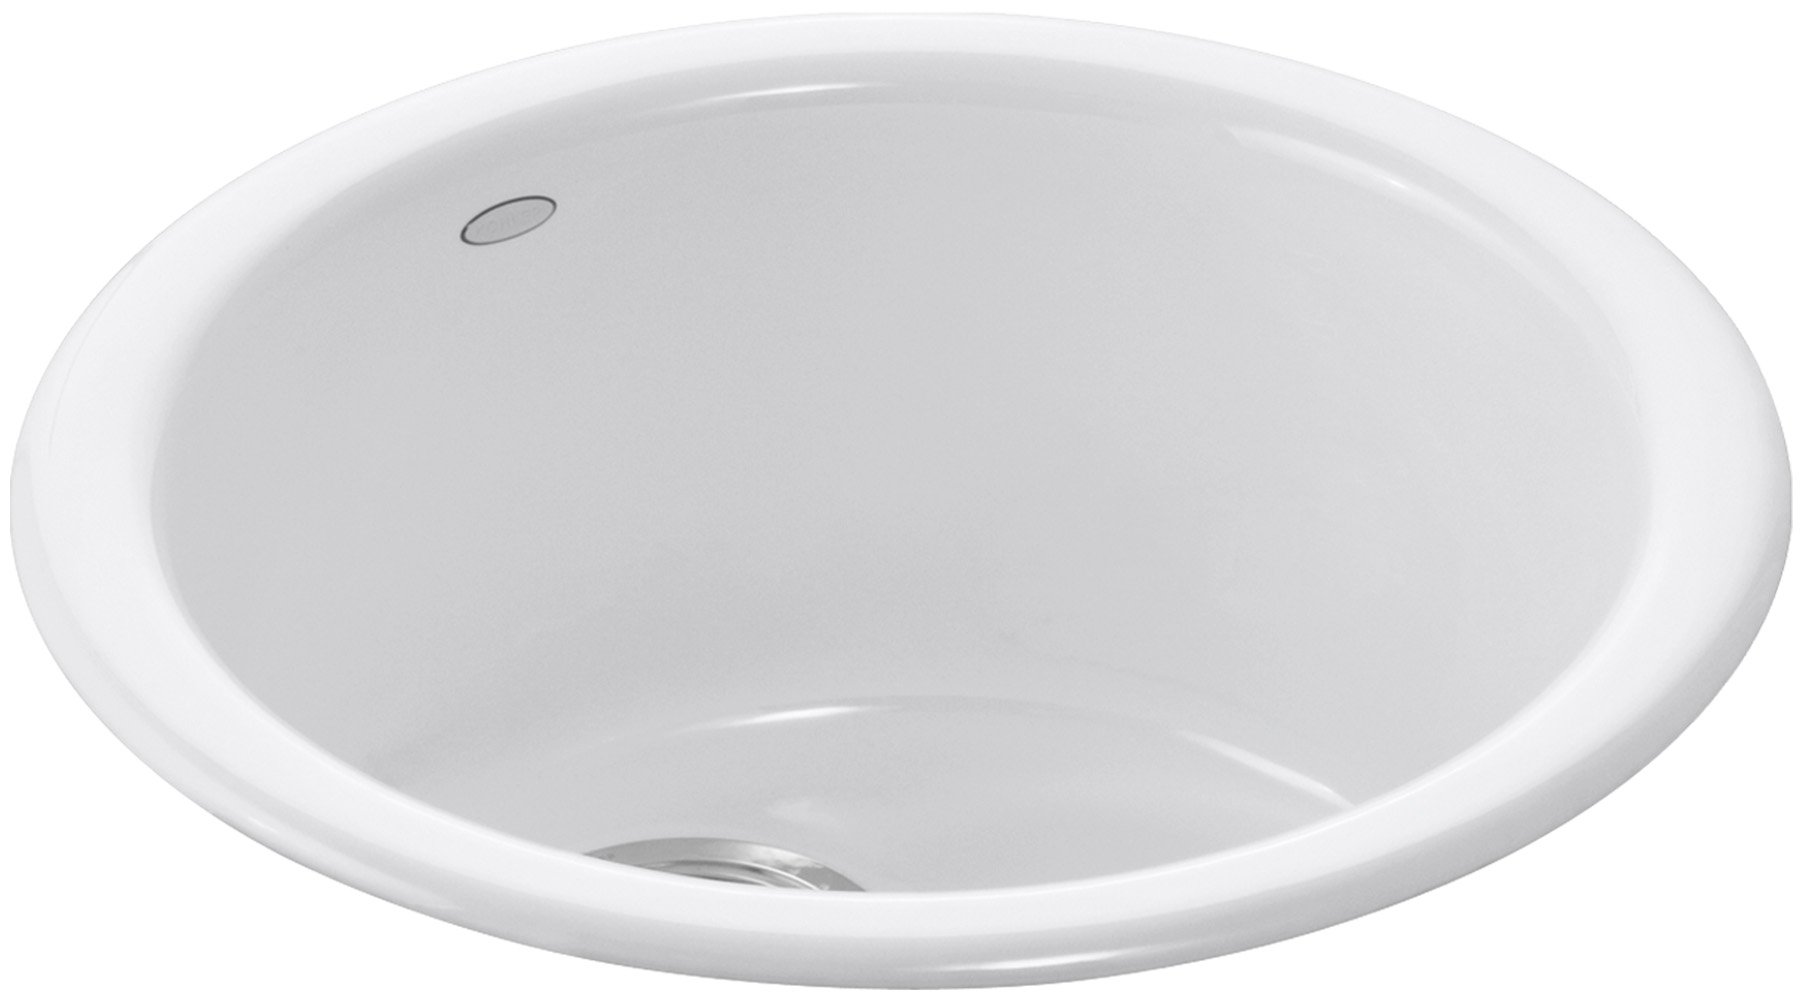 KOHLER K-6565-0 Porto Fino Self-Rimming Undercounter Entertainment Sink, White